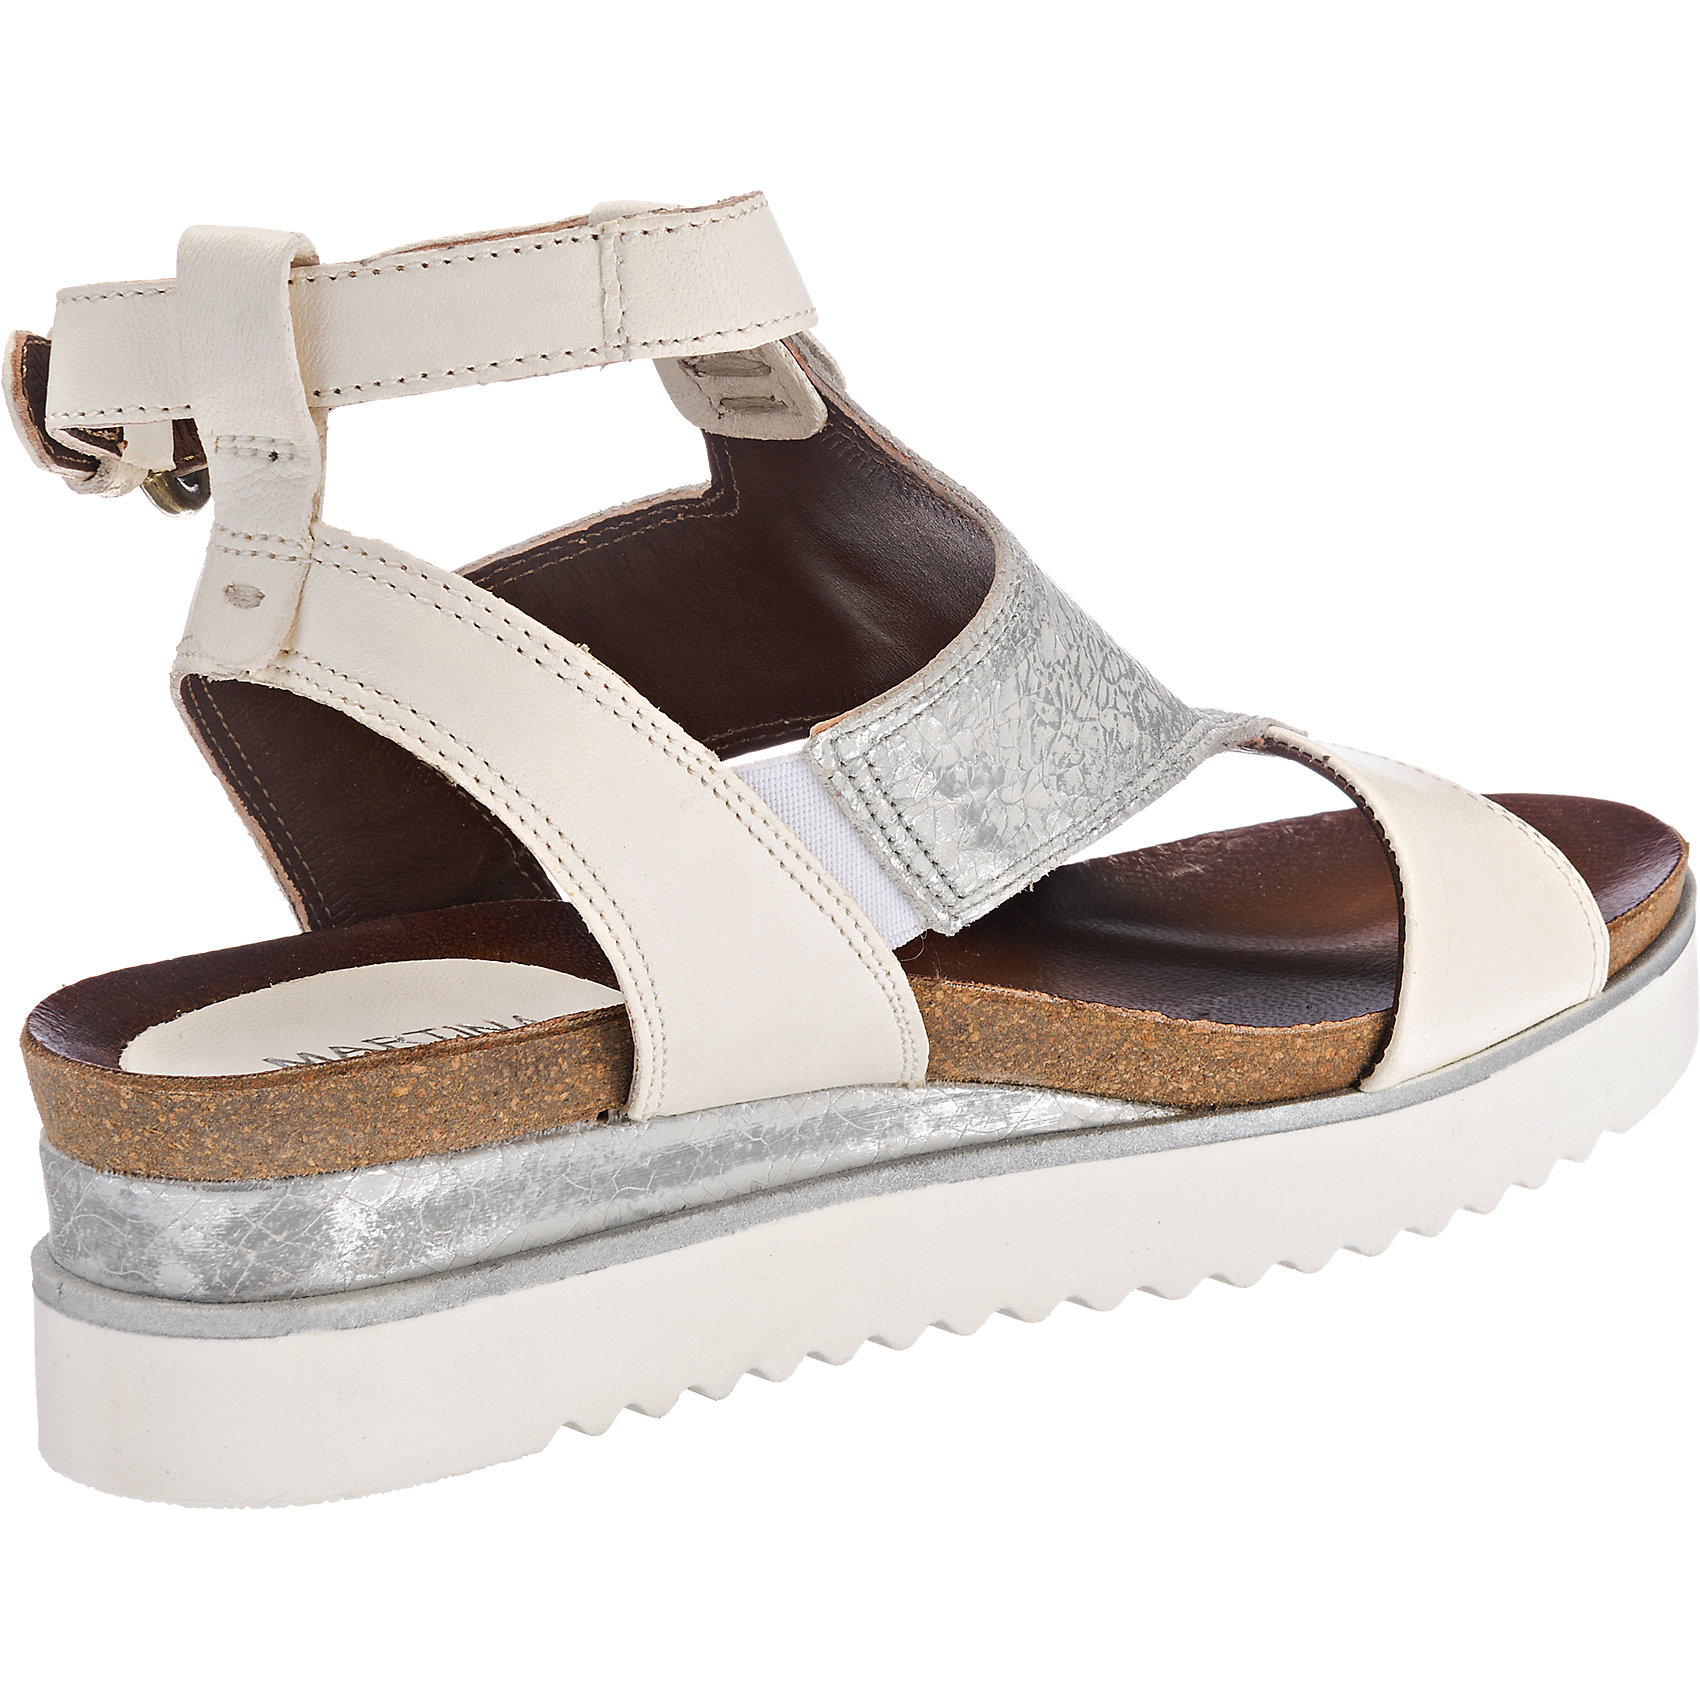 Neu Martina Buraro Spak Sandaletten 5765542 für Damen weiß-kombi weiß-kombi Damen schwarz 5eb442